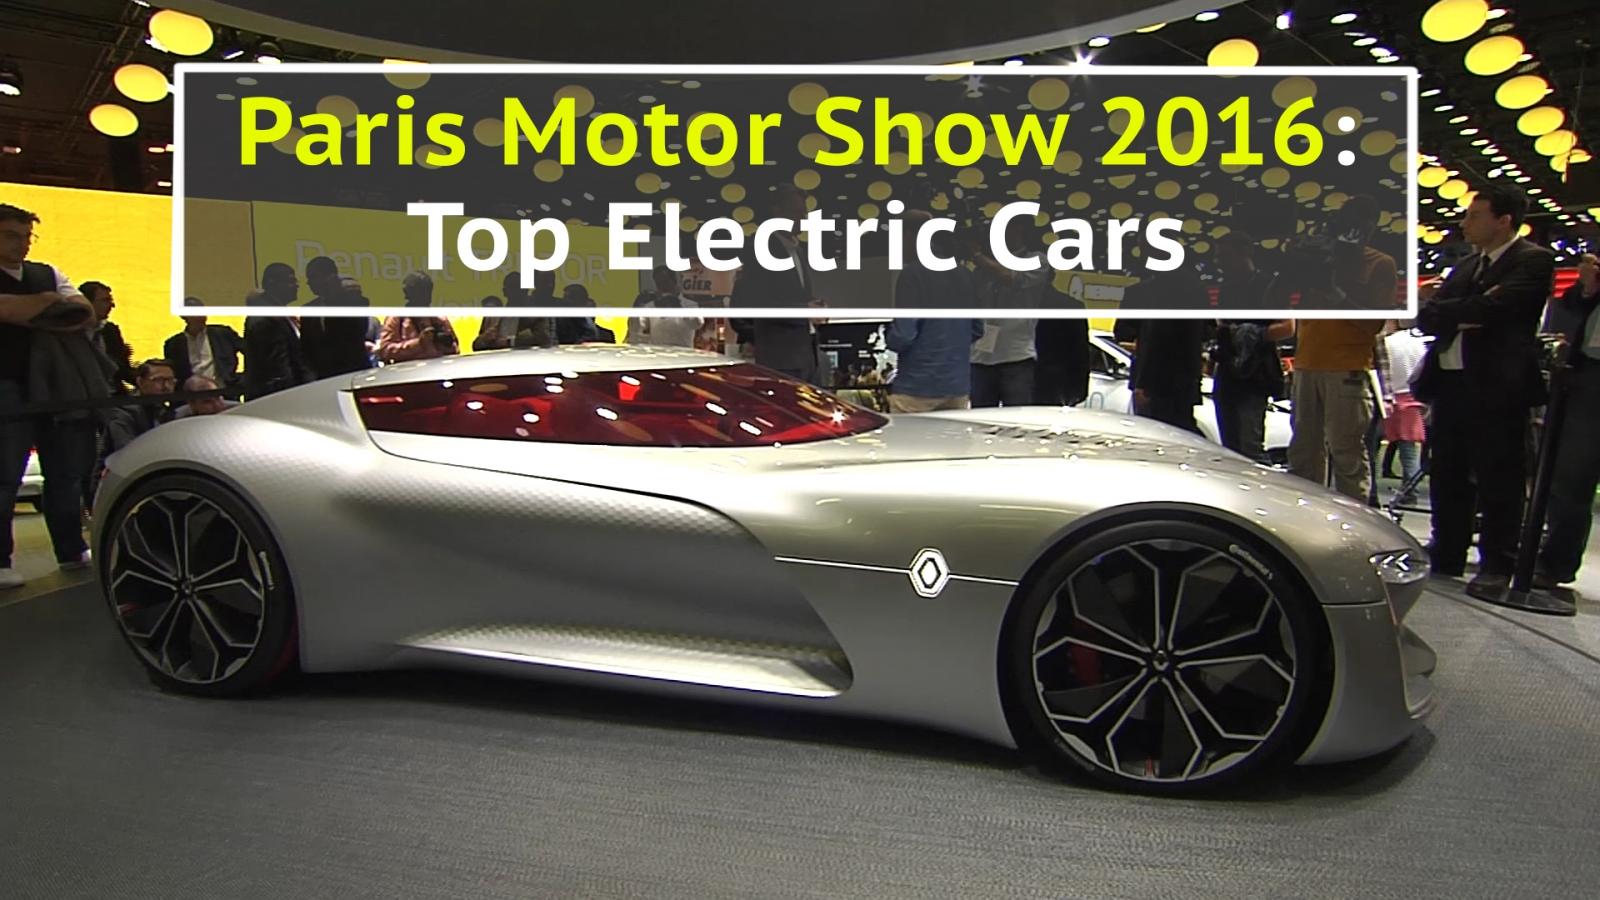 paris motor show 2016 the best electric cars. Black Bedroom Furniture Sets. Home Design Ideas